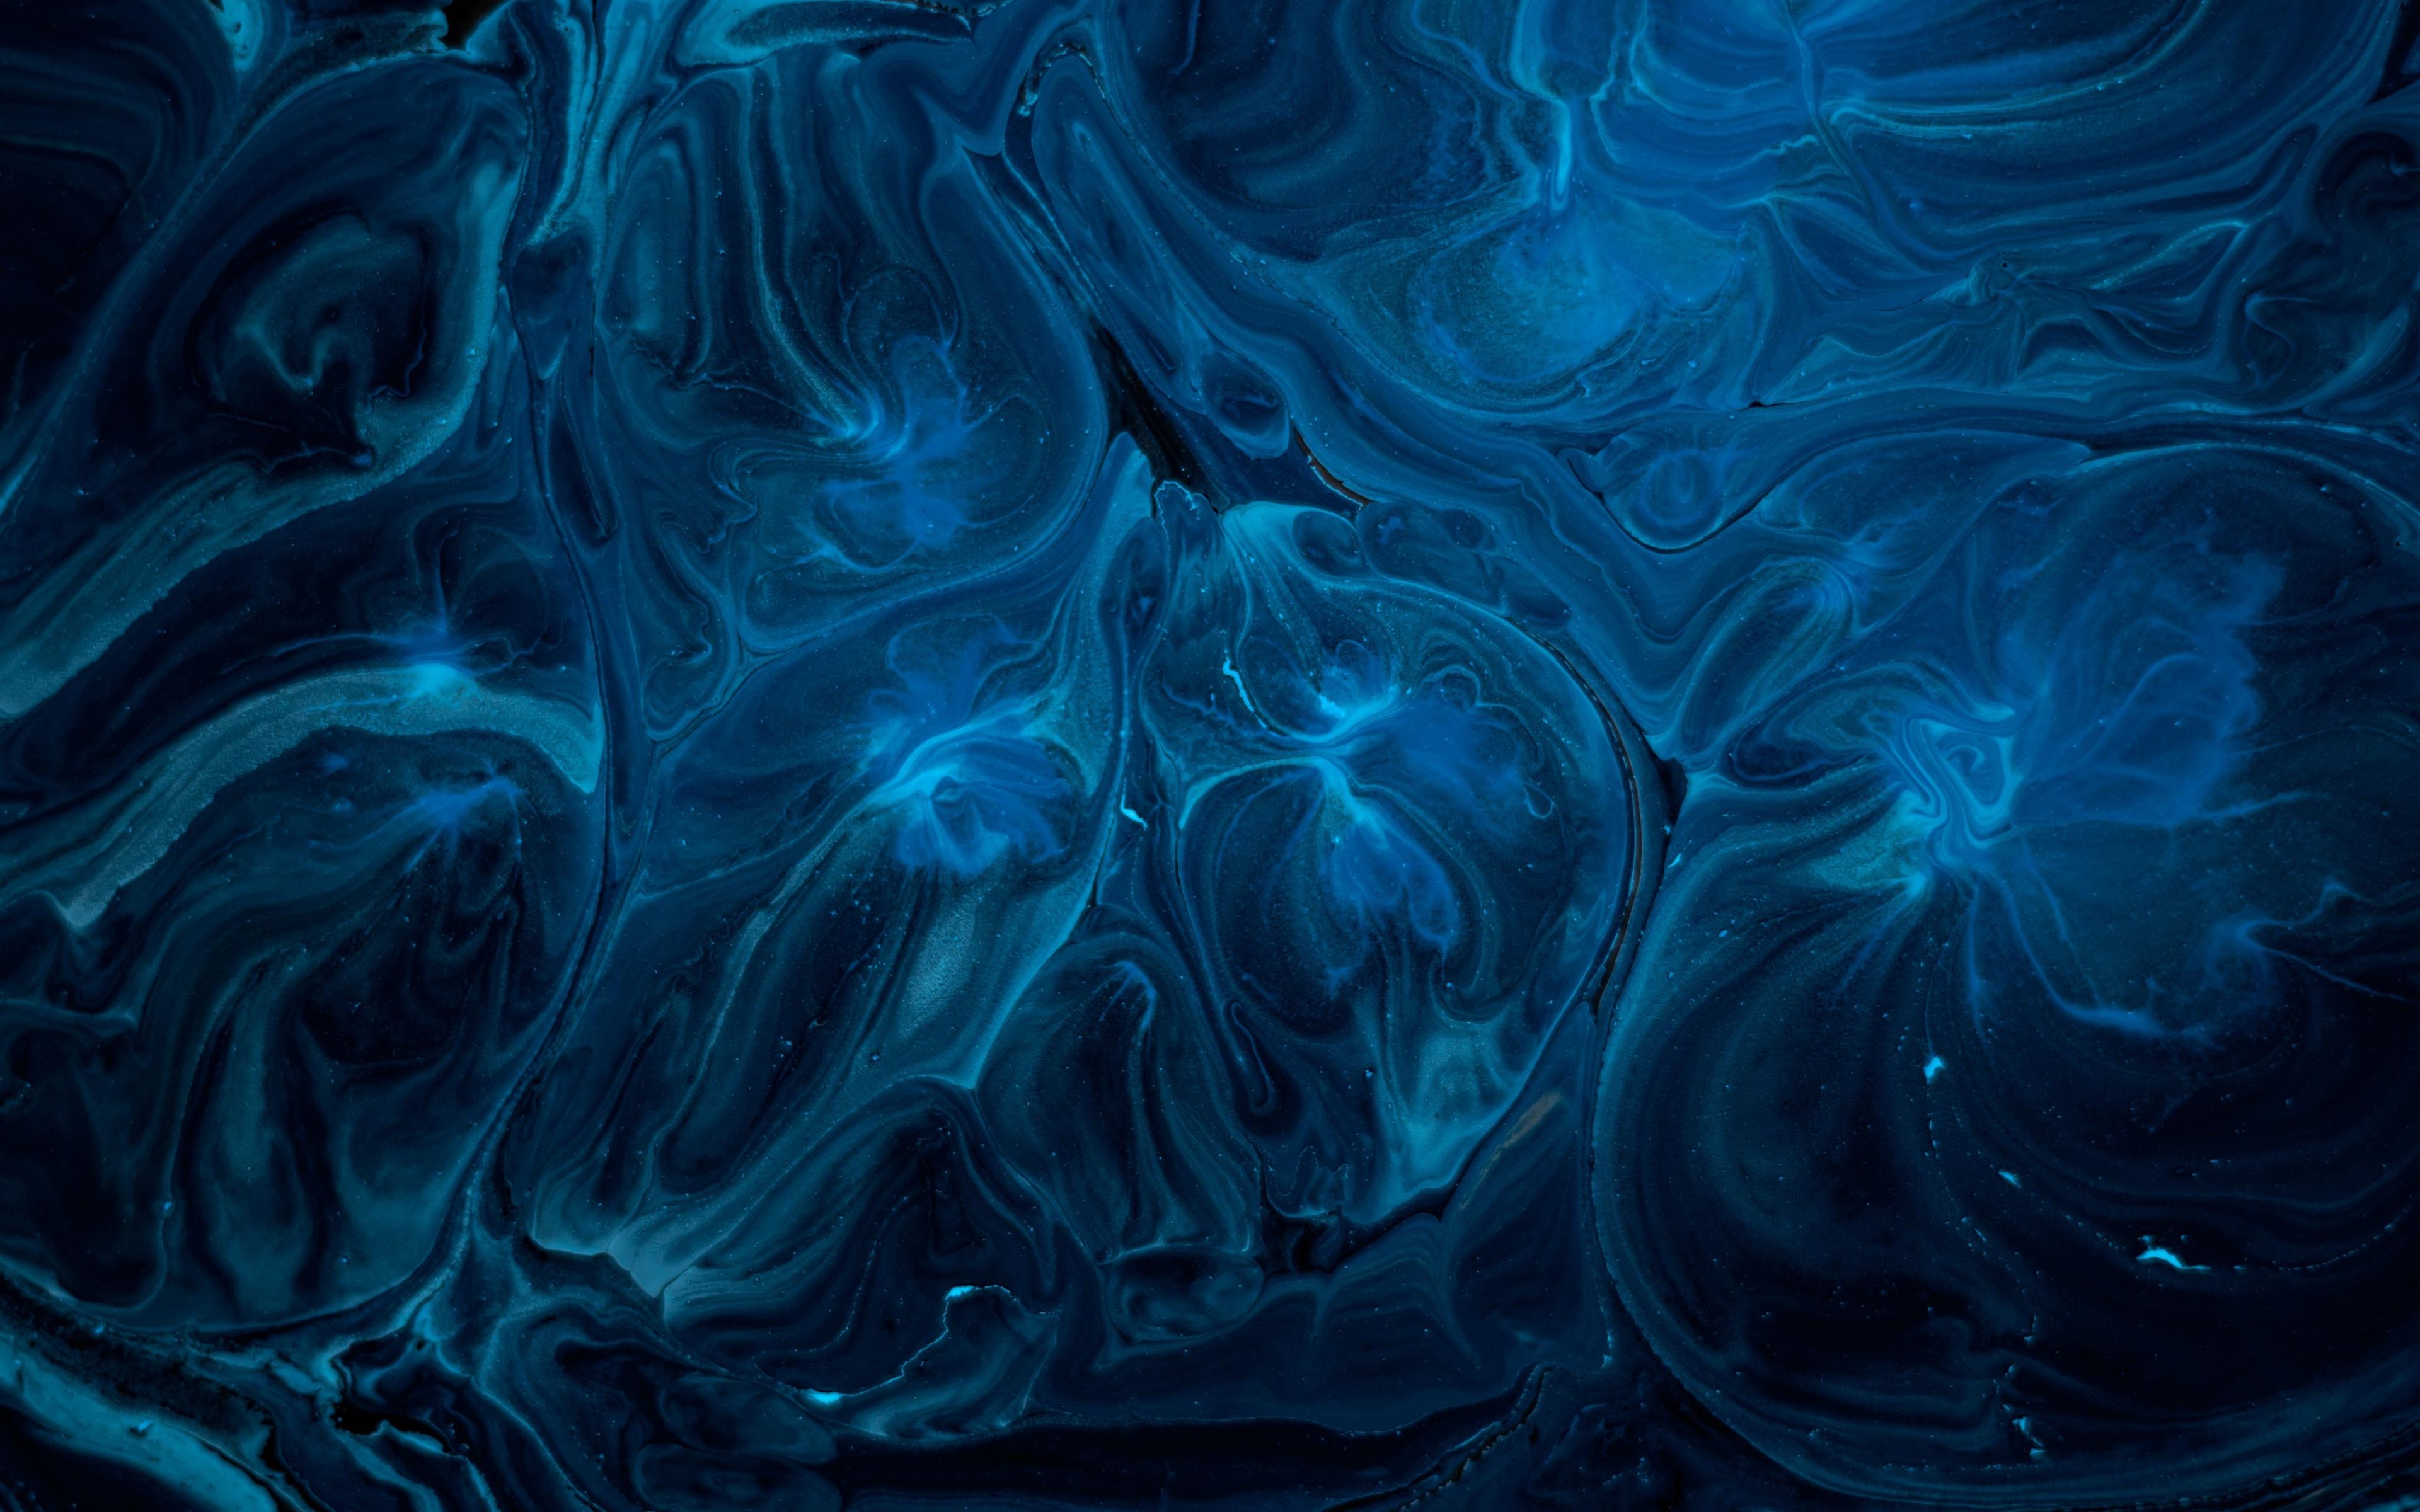 Download 3840x2400 wallpaper blue, texture, artwork, 4k, ultra hd ...